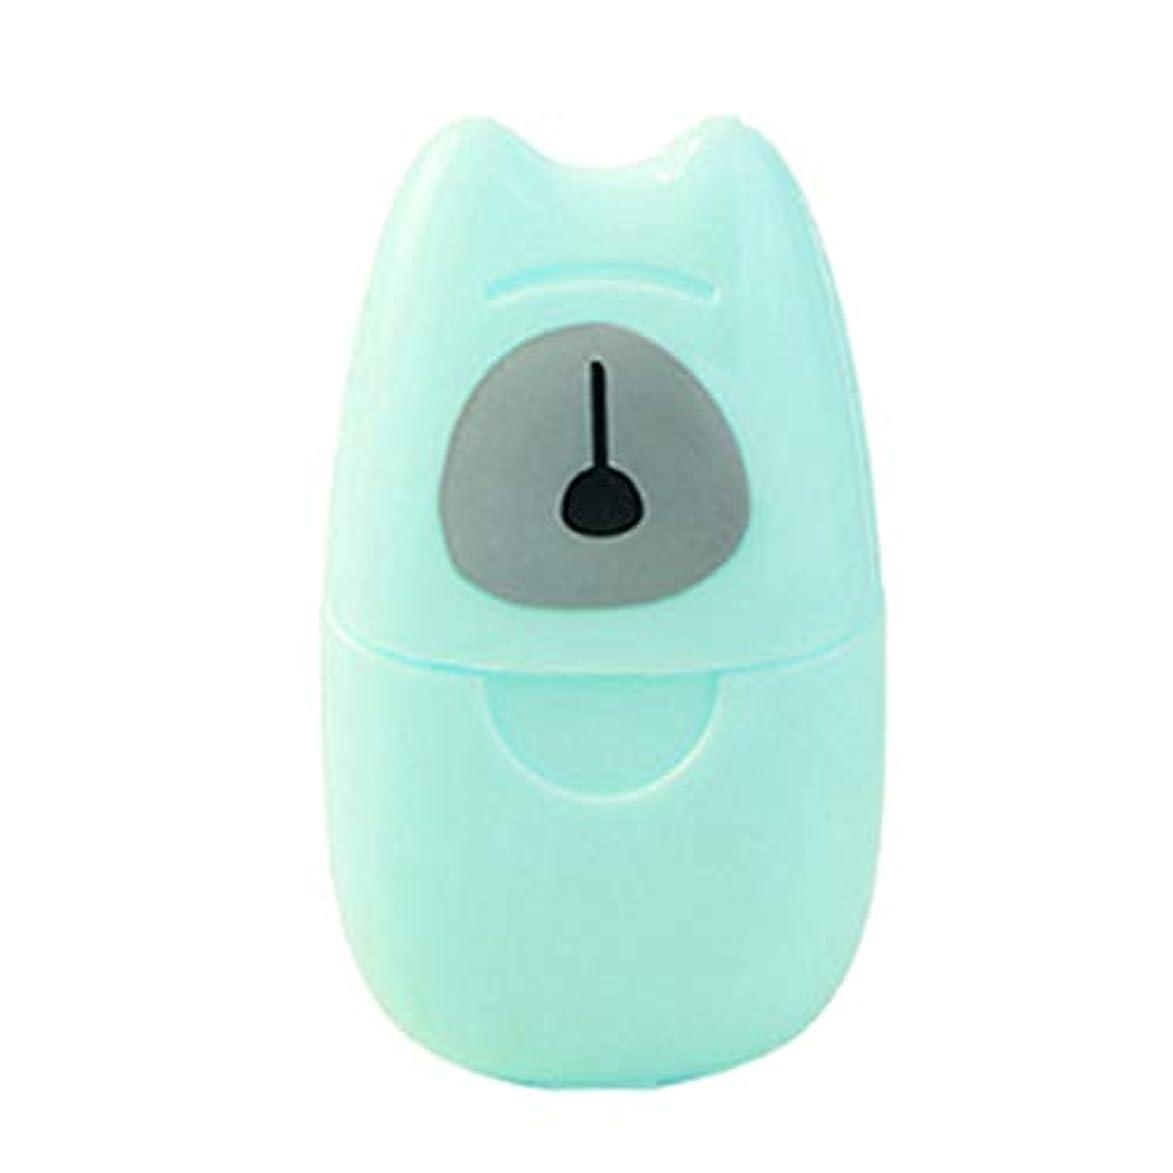 Geafos ペーパーソープ 紙せっけん 石鹸シート 除菌 香り 超軽量 持ち運び 手洗い 携帯便利 ケース付き お風呂 お出かけ 旅行 3個セット